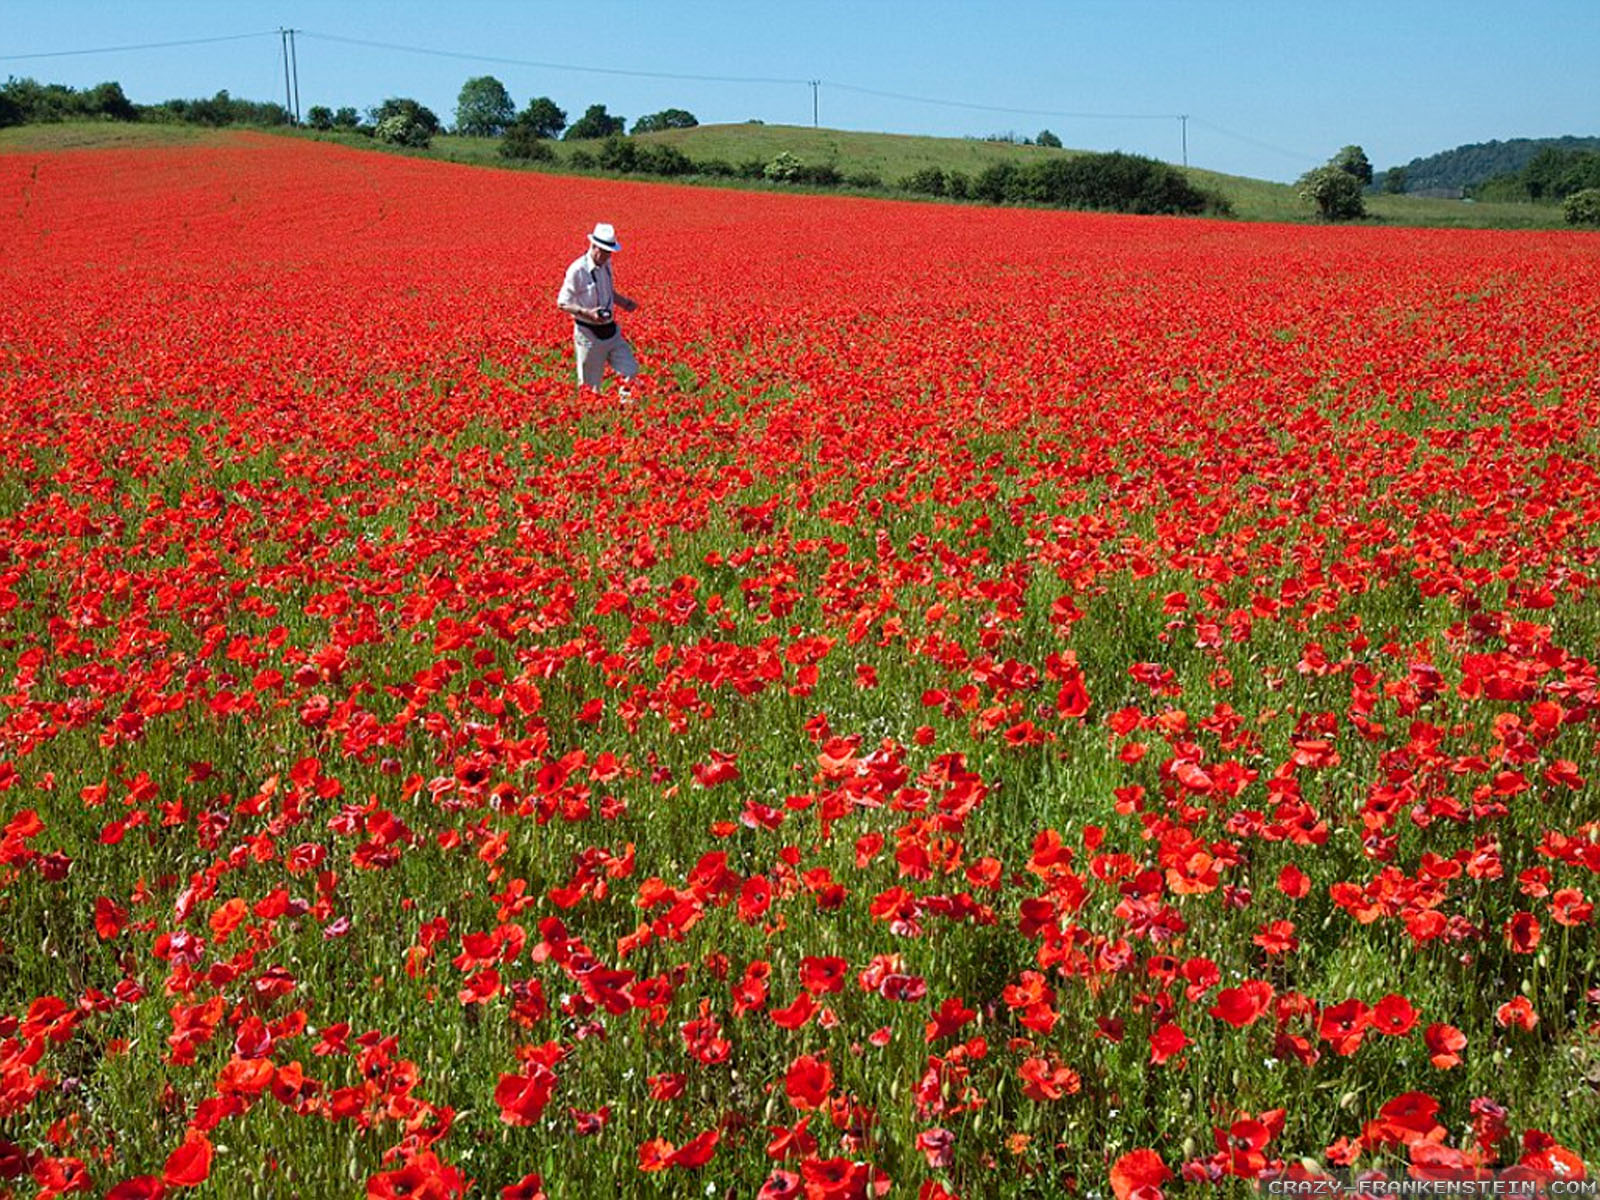 Wallpaper: Red poppies flower field wallpapers. Resolution: 1024x768   1280x1024   1600x1200